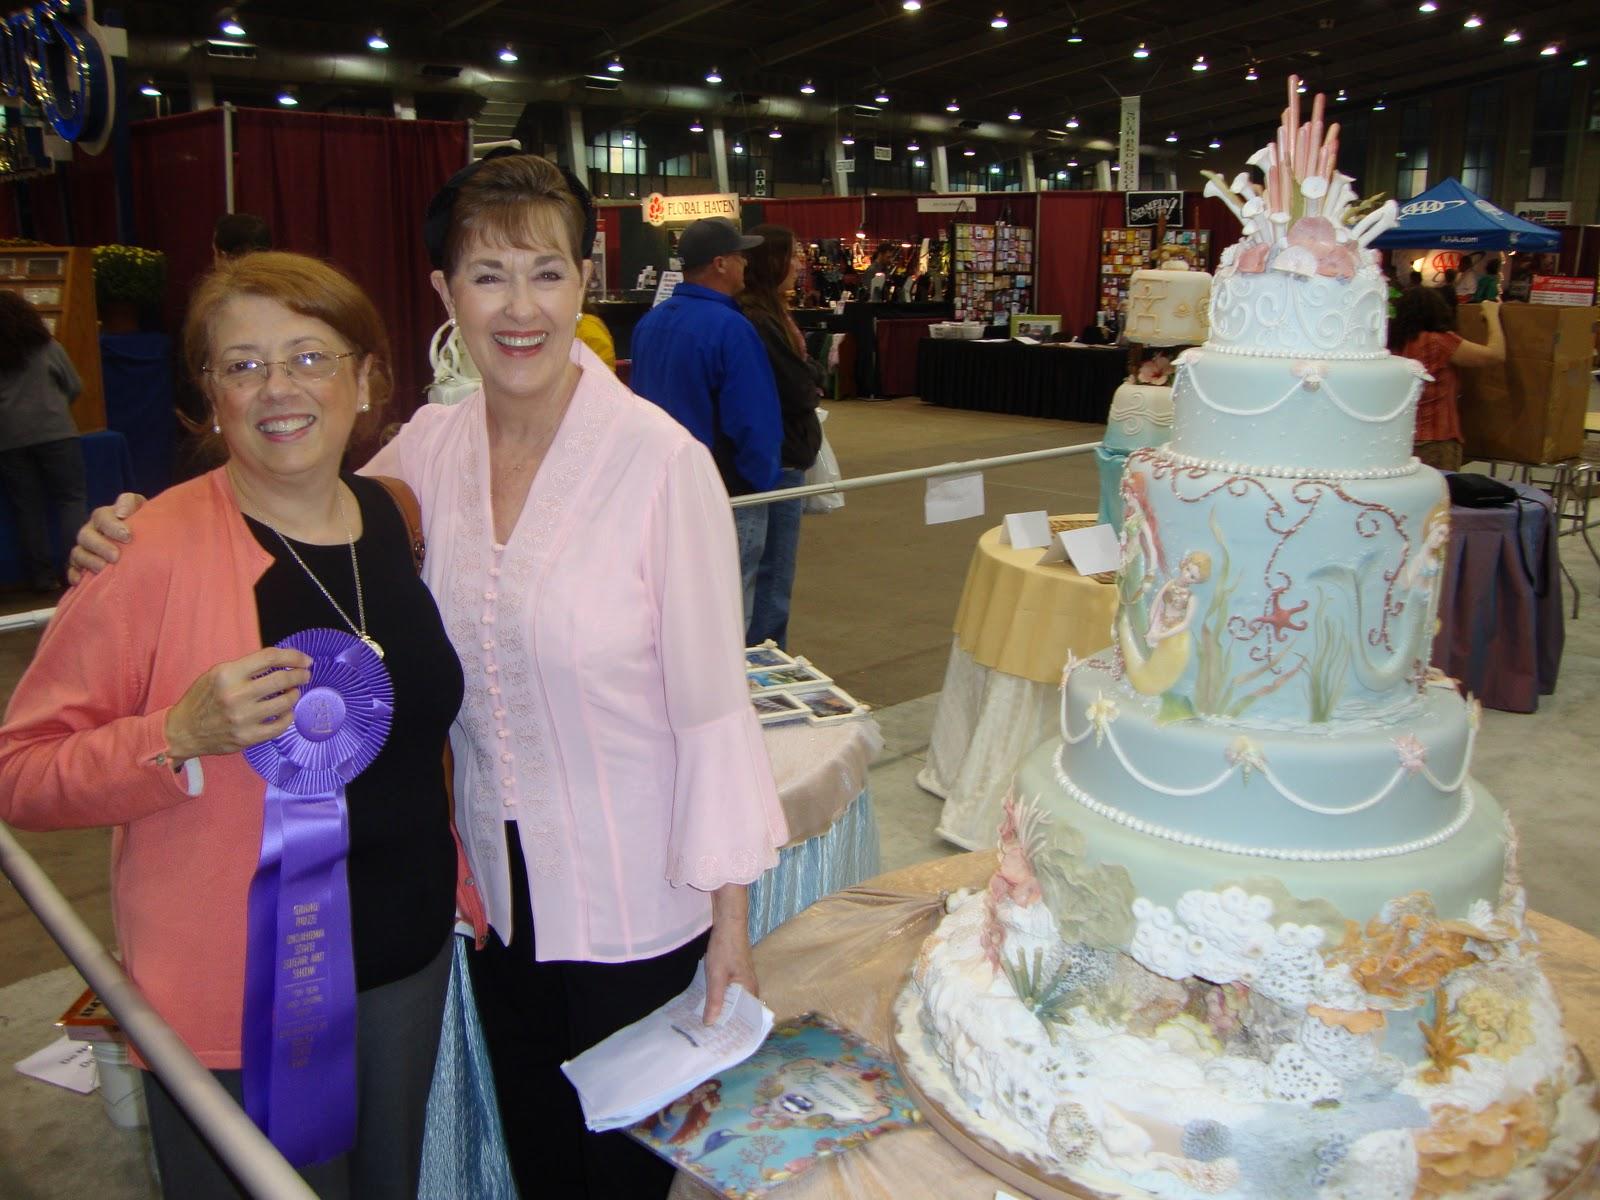 Cake Blog Because Every Cake has a Story The Grand National